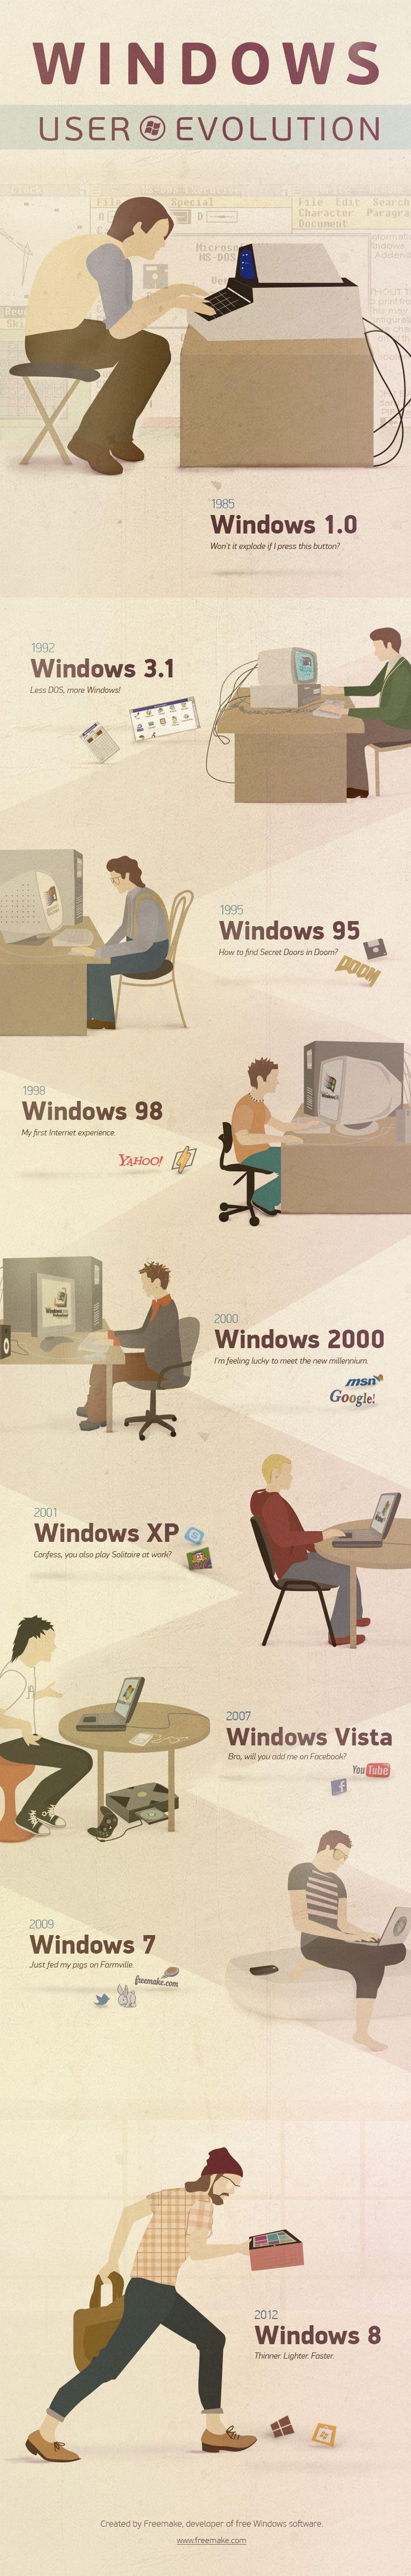 #Windows user evolution infographic